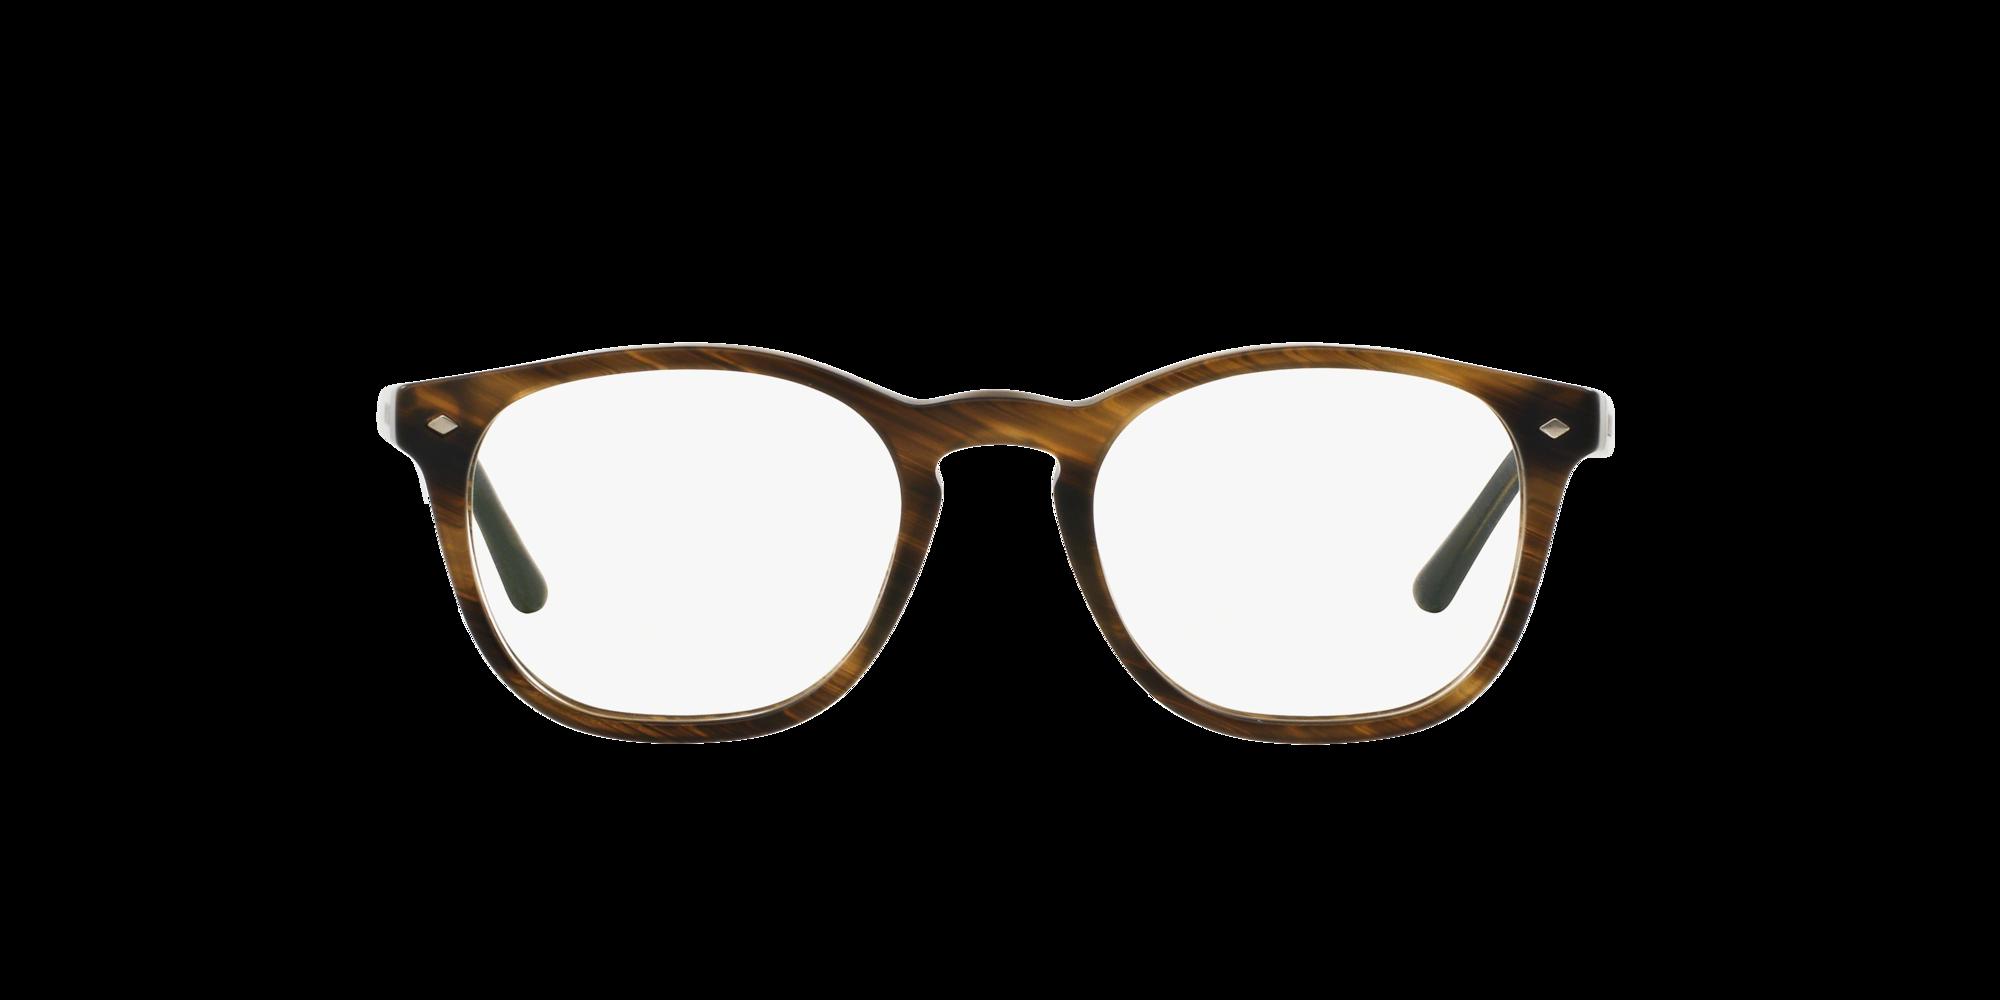 Image for AR7074 from LensCrafters   Glasses, Prescription Glasses Online, Eyewear